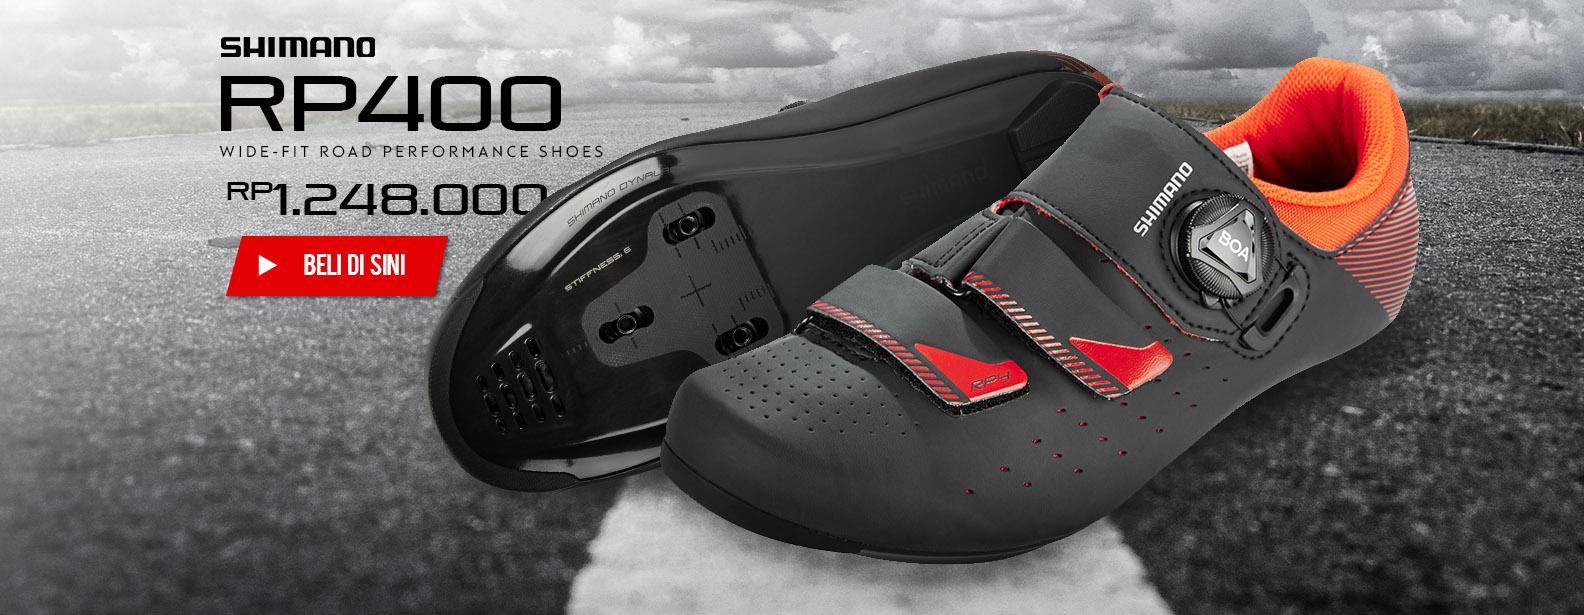 Shimano Sepatu Sepeda RP400 Wide Fit Road Performance